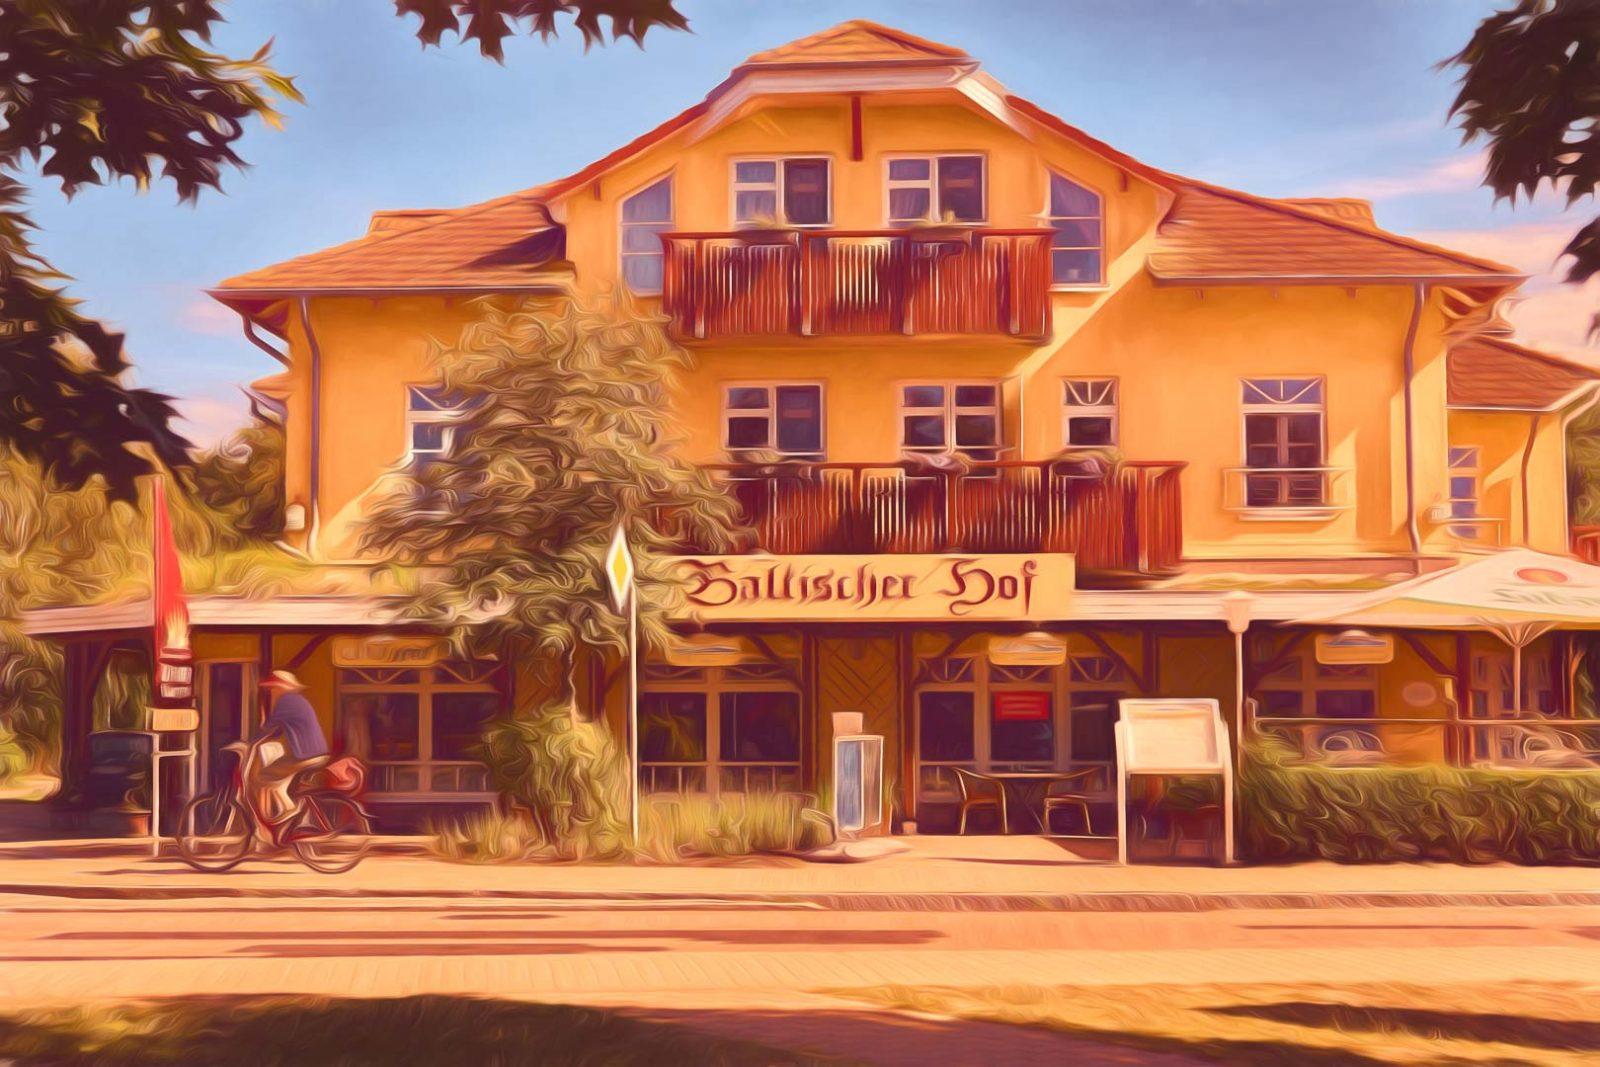 ahrensoop baltischer hof germany painterly paintography fine art print europe mecklenburg vorpommern darss hotel bicycle street clouds house building restaurant